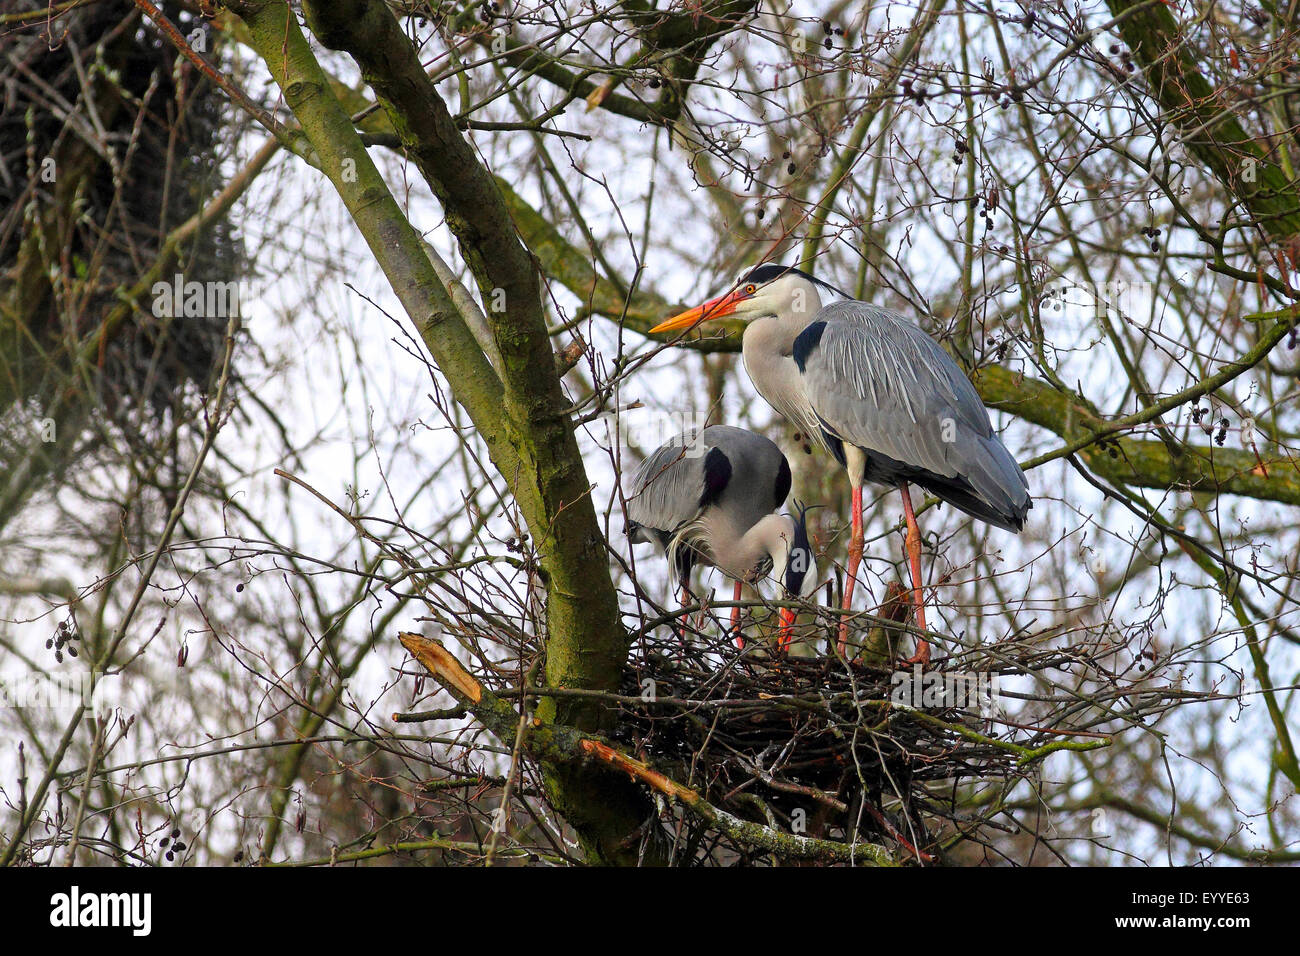 grey heron (Ardea cinerea), breeding pair at the nest, Germany - Stock Image